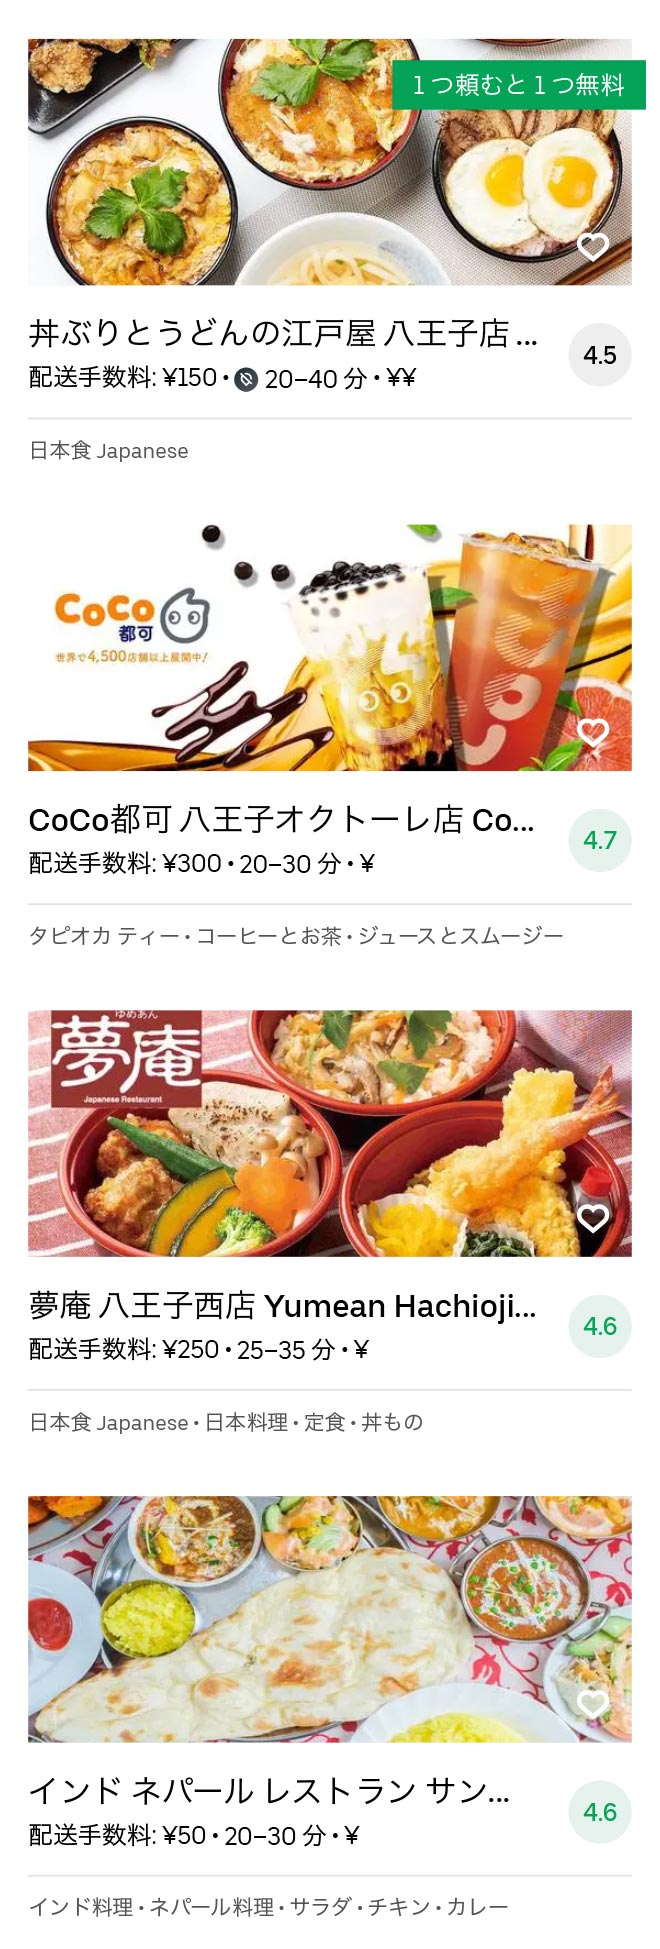 Nishi hatioji menu 2010 06